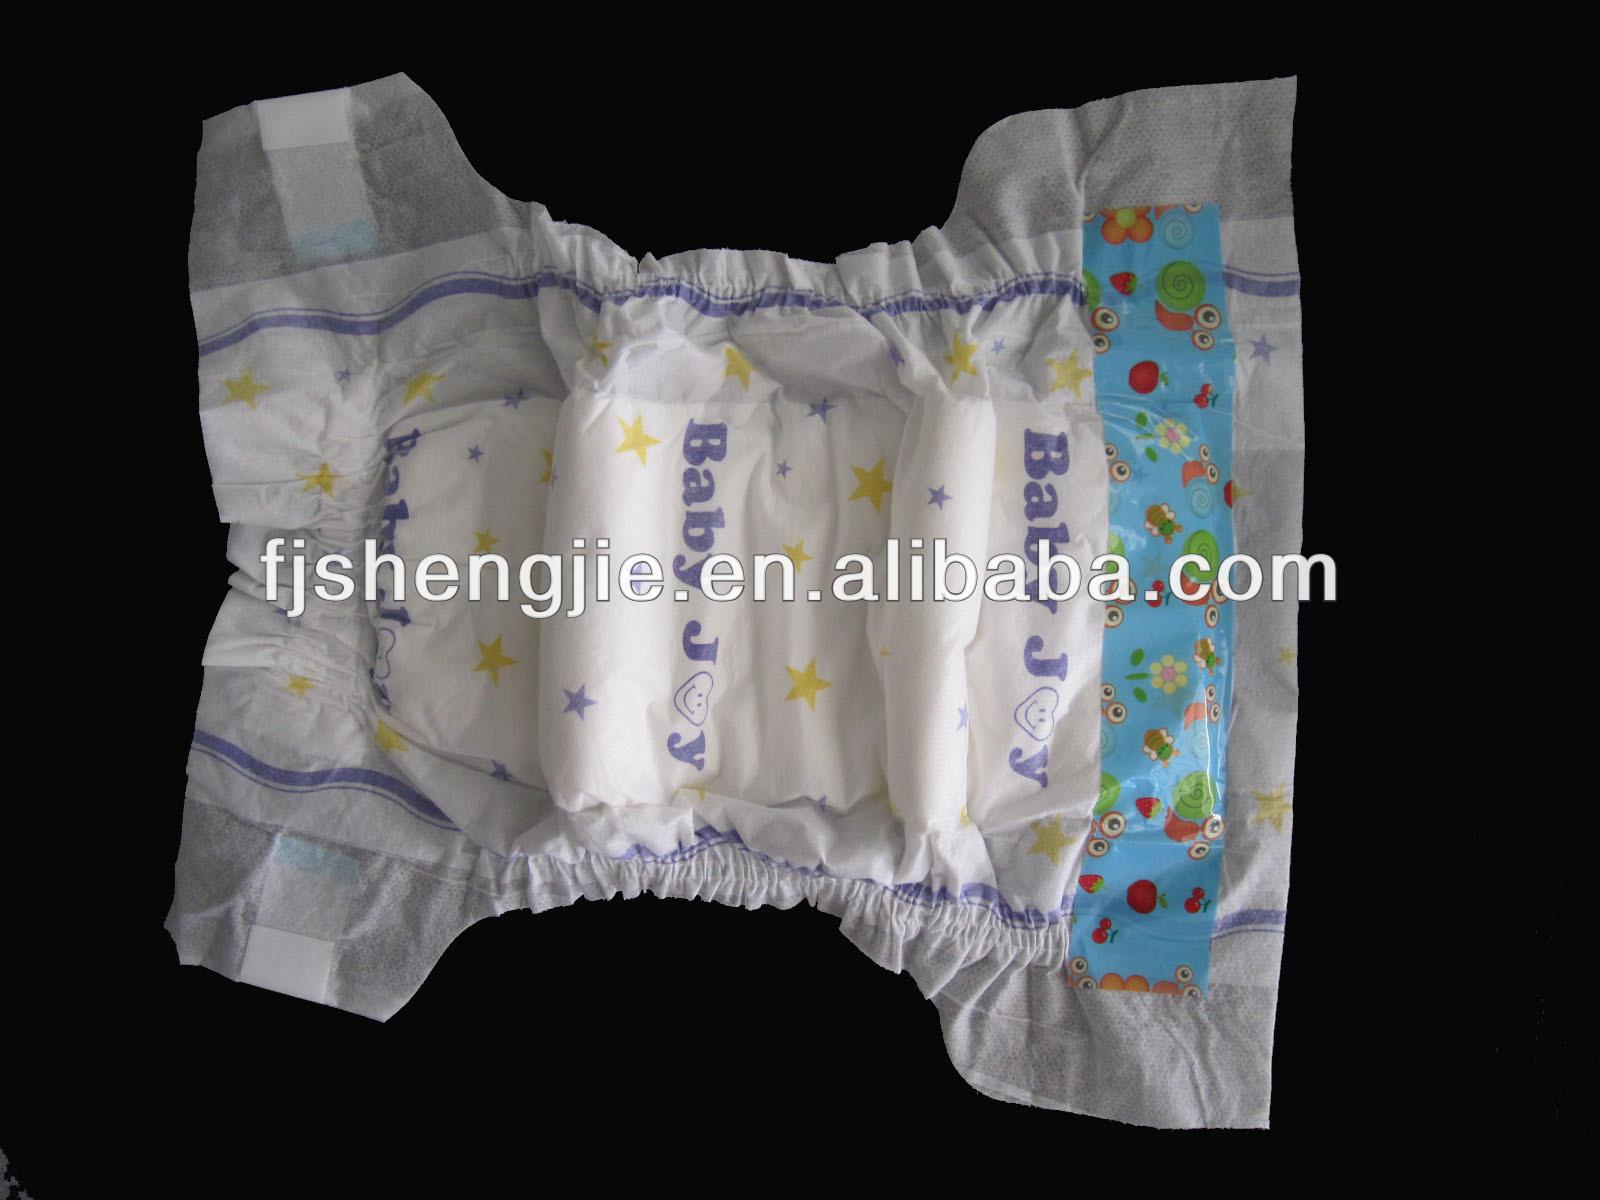 Cloth Like Backsheet Elastic Waitsband Sleepy Baby Diaper